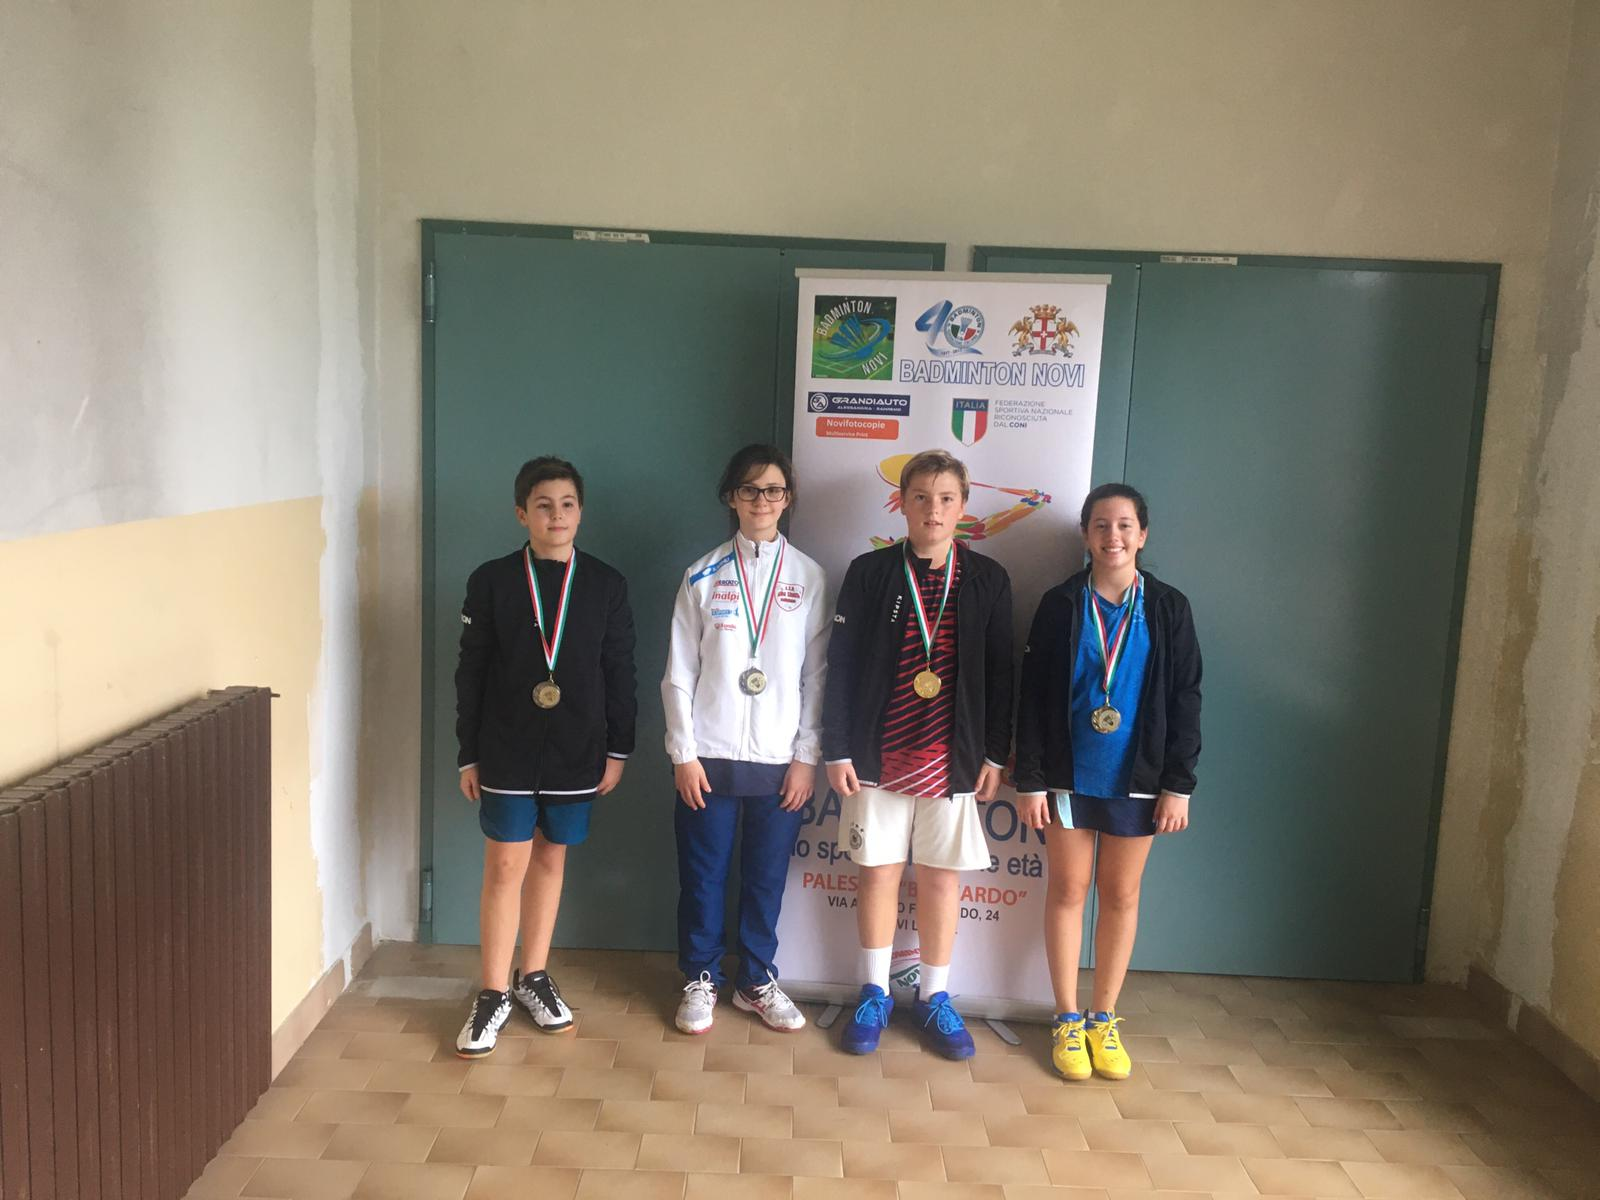 Badminton: Alba Shuttle, continua l'ottimo momento! Altre medaglie da Novi Ligure - IdeaWebTv